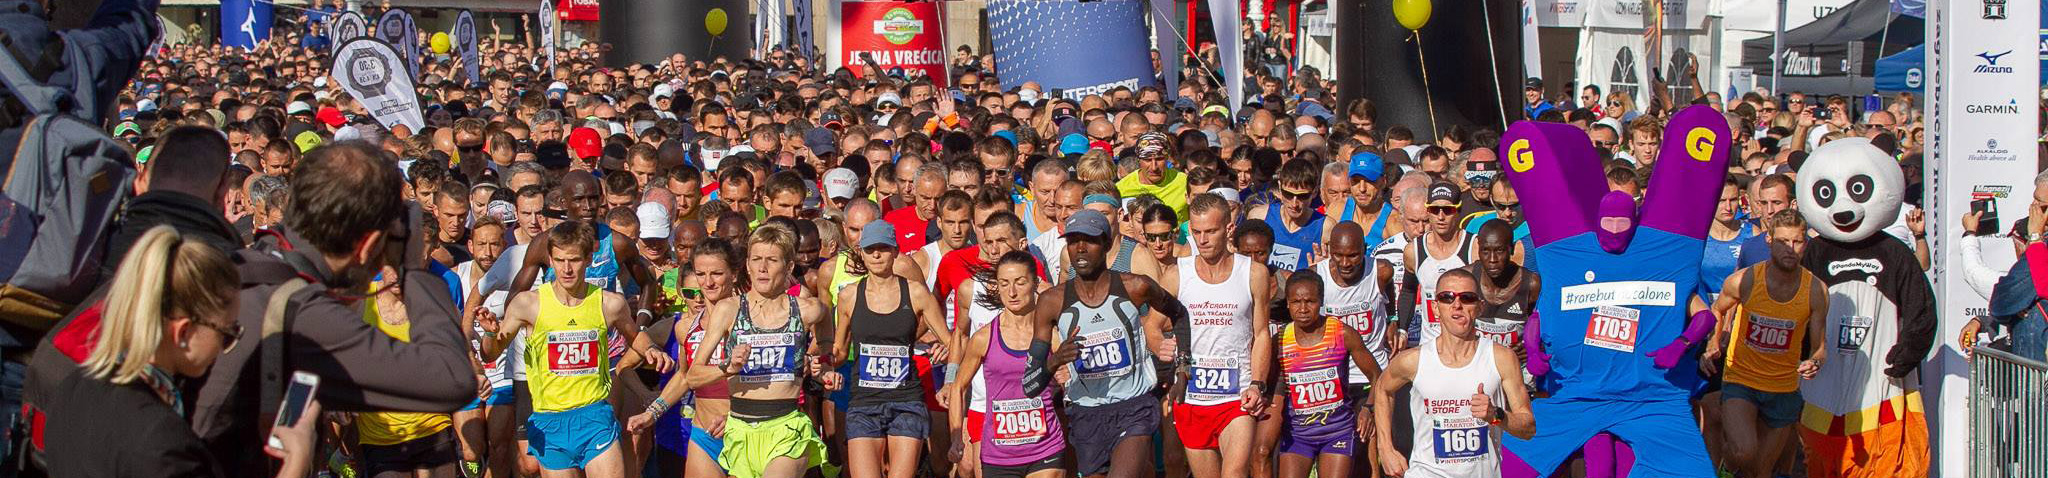 https://www.zagreb-marathon.com/wp-content/uploads/maraton02.jpg